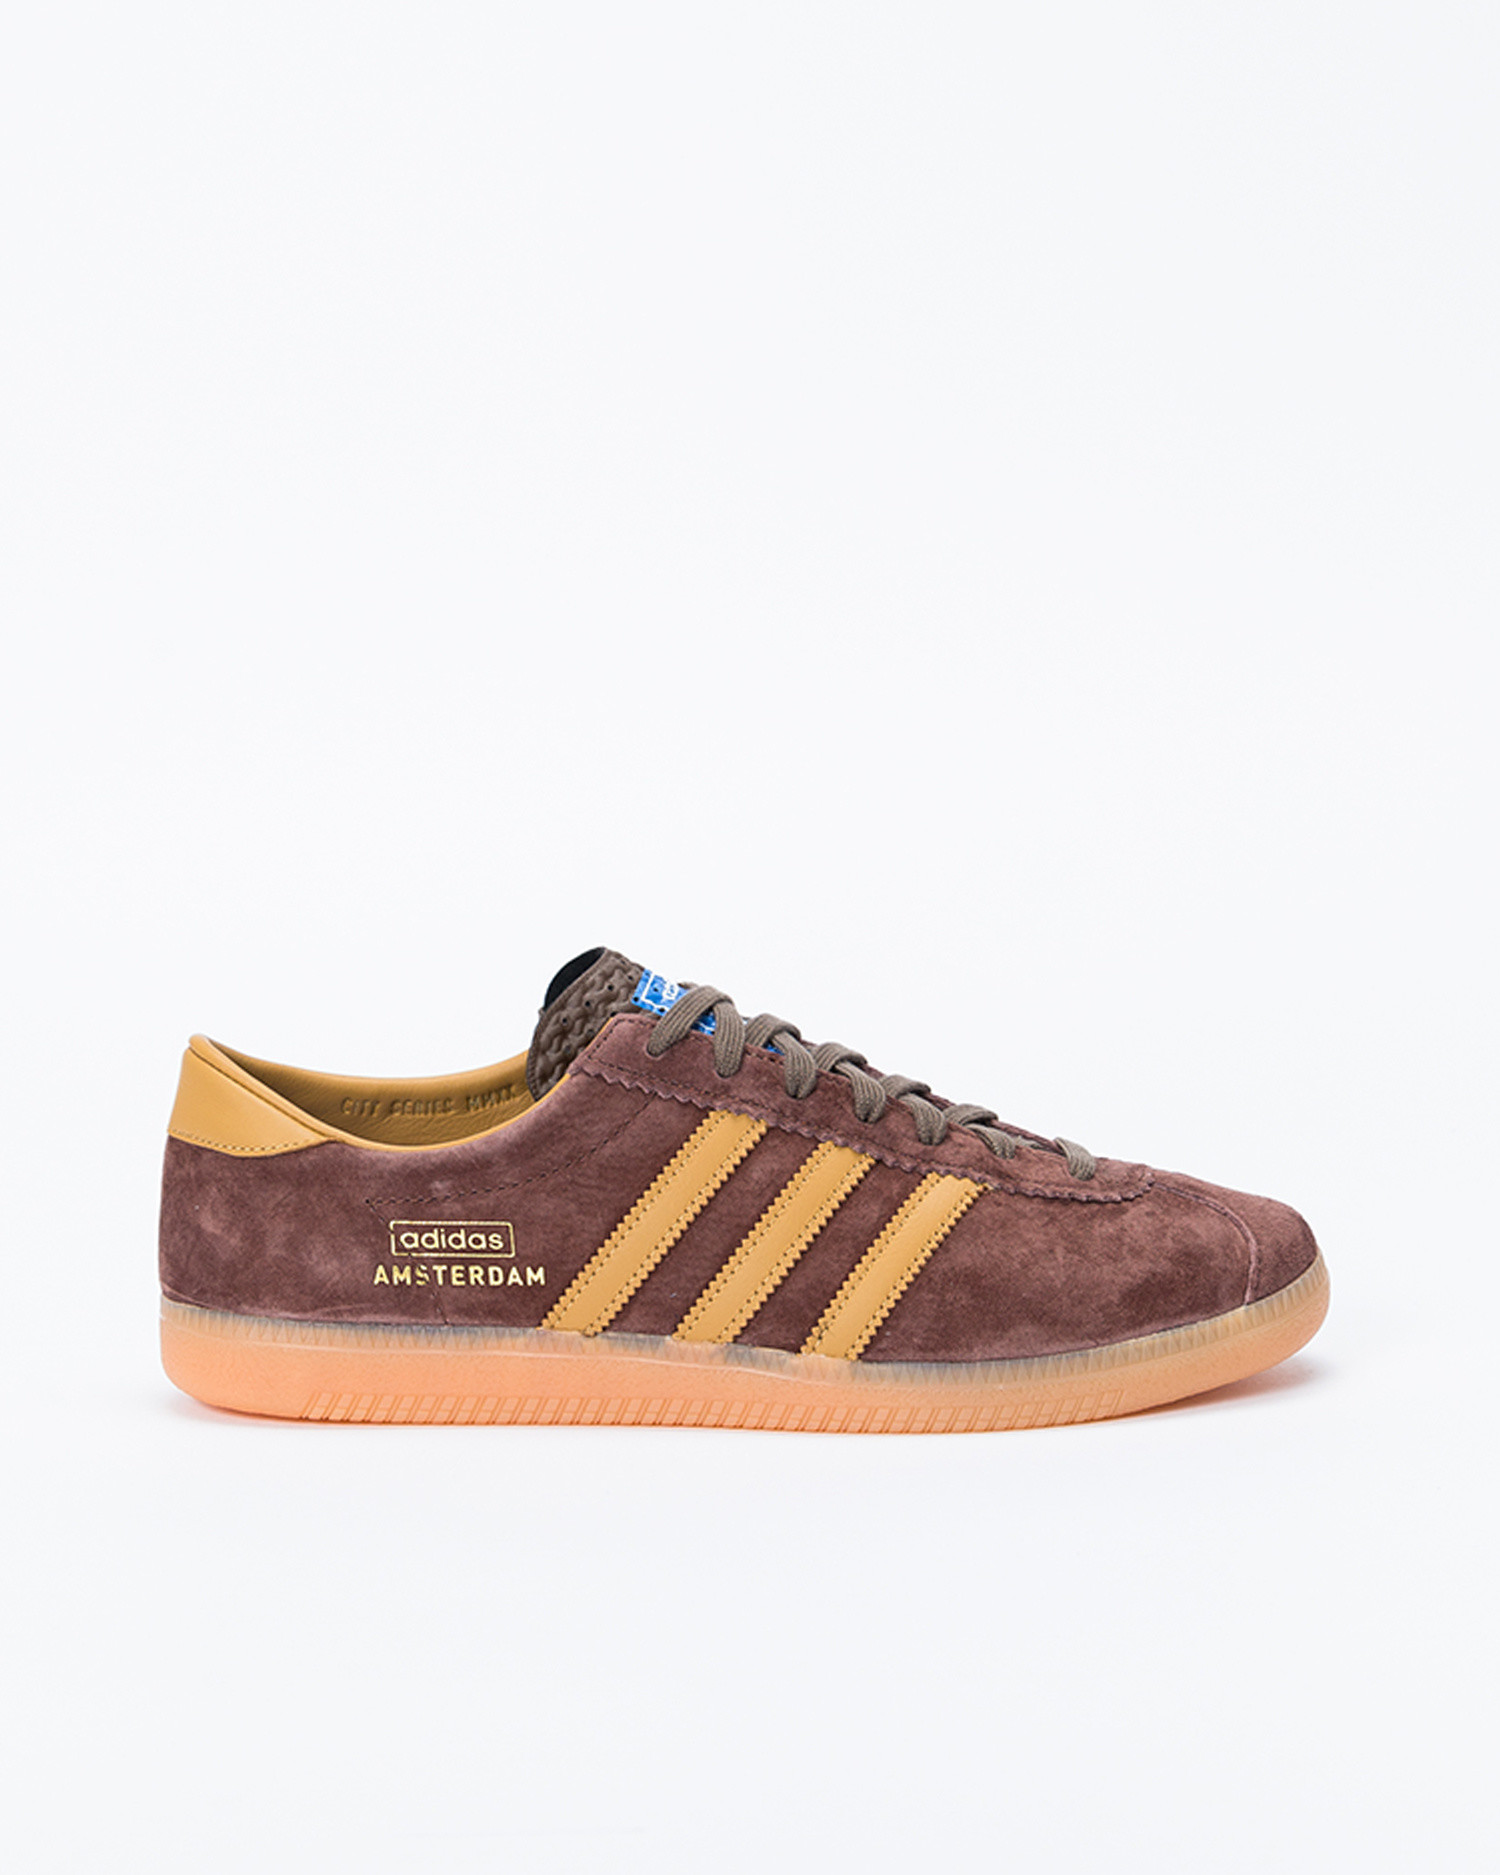 adidas Originals Amsterdam Dusurus/Brown/Mesa